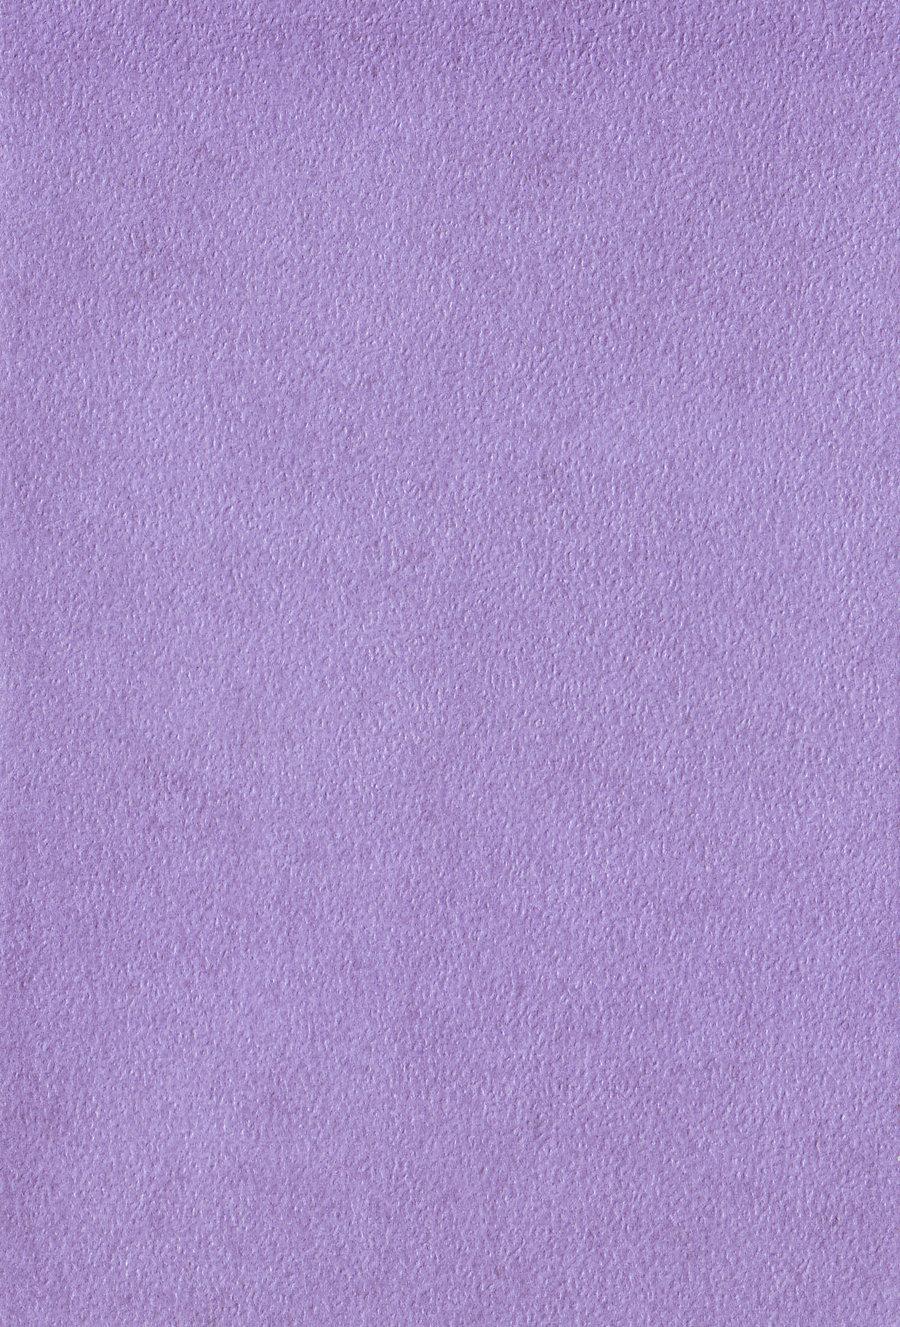 Wallpaper   Lilac by tamaraR stock 900x1327